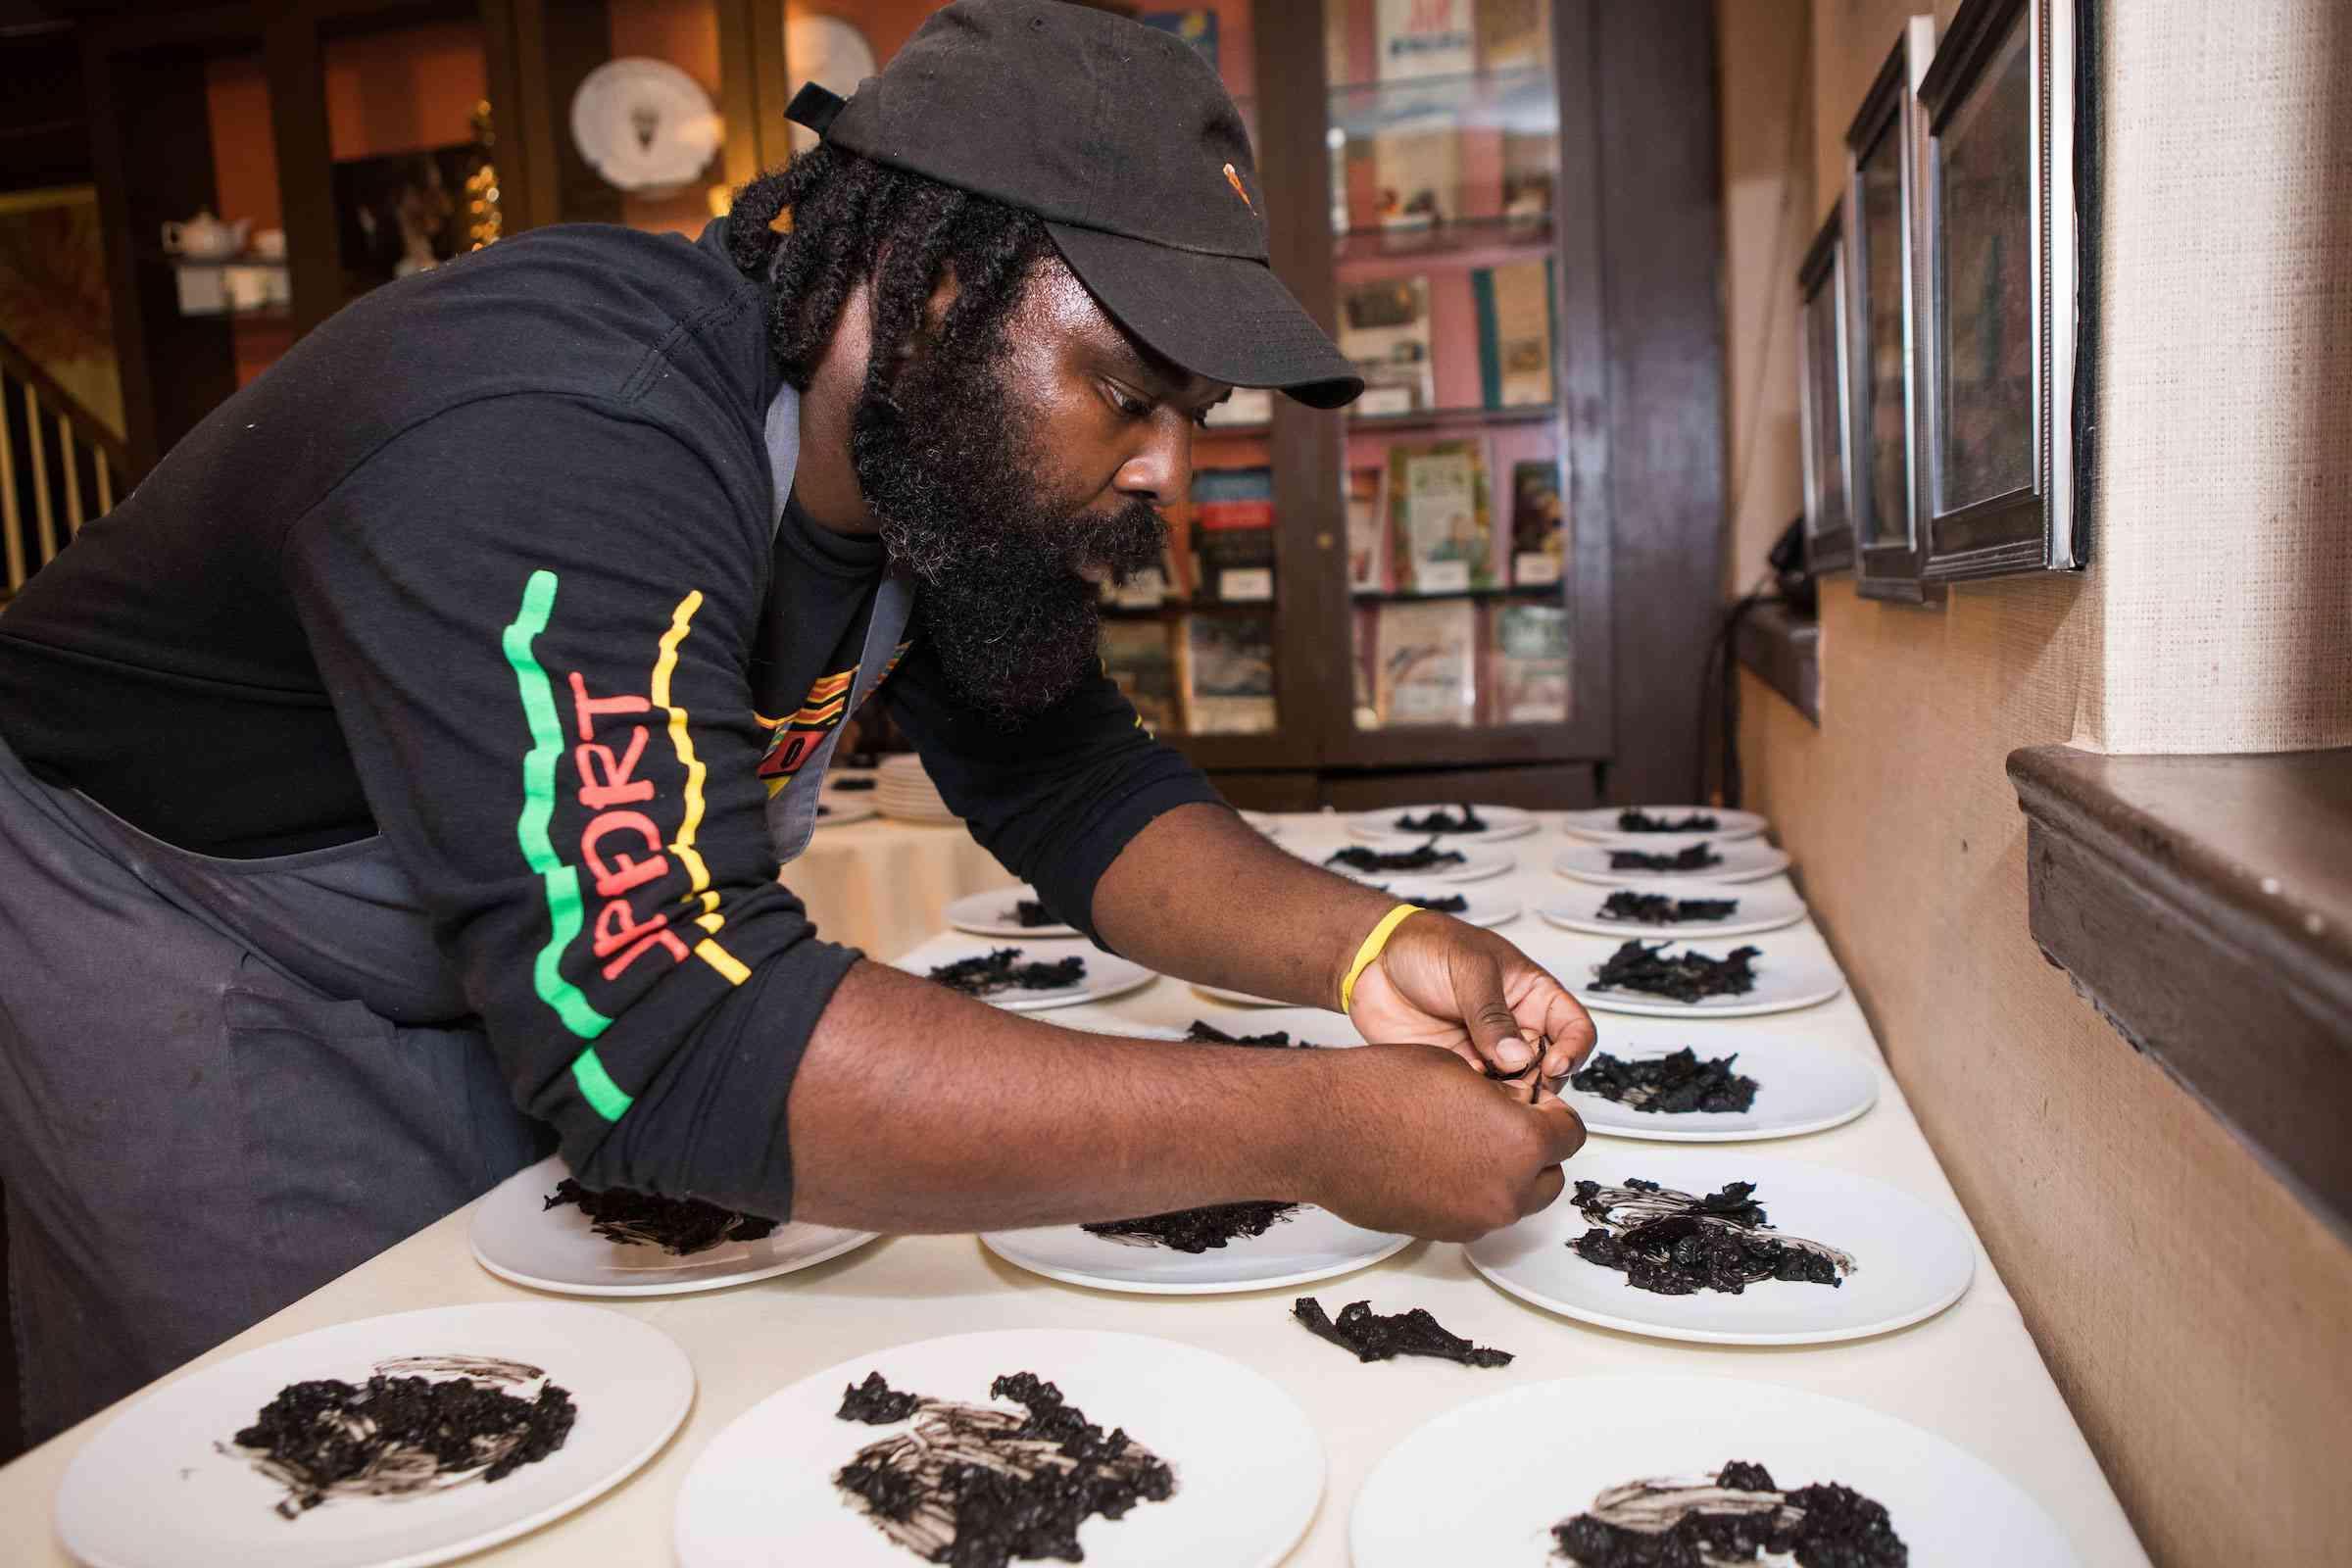 Black Food Folks Chef Plating Dishes